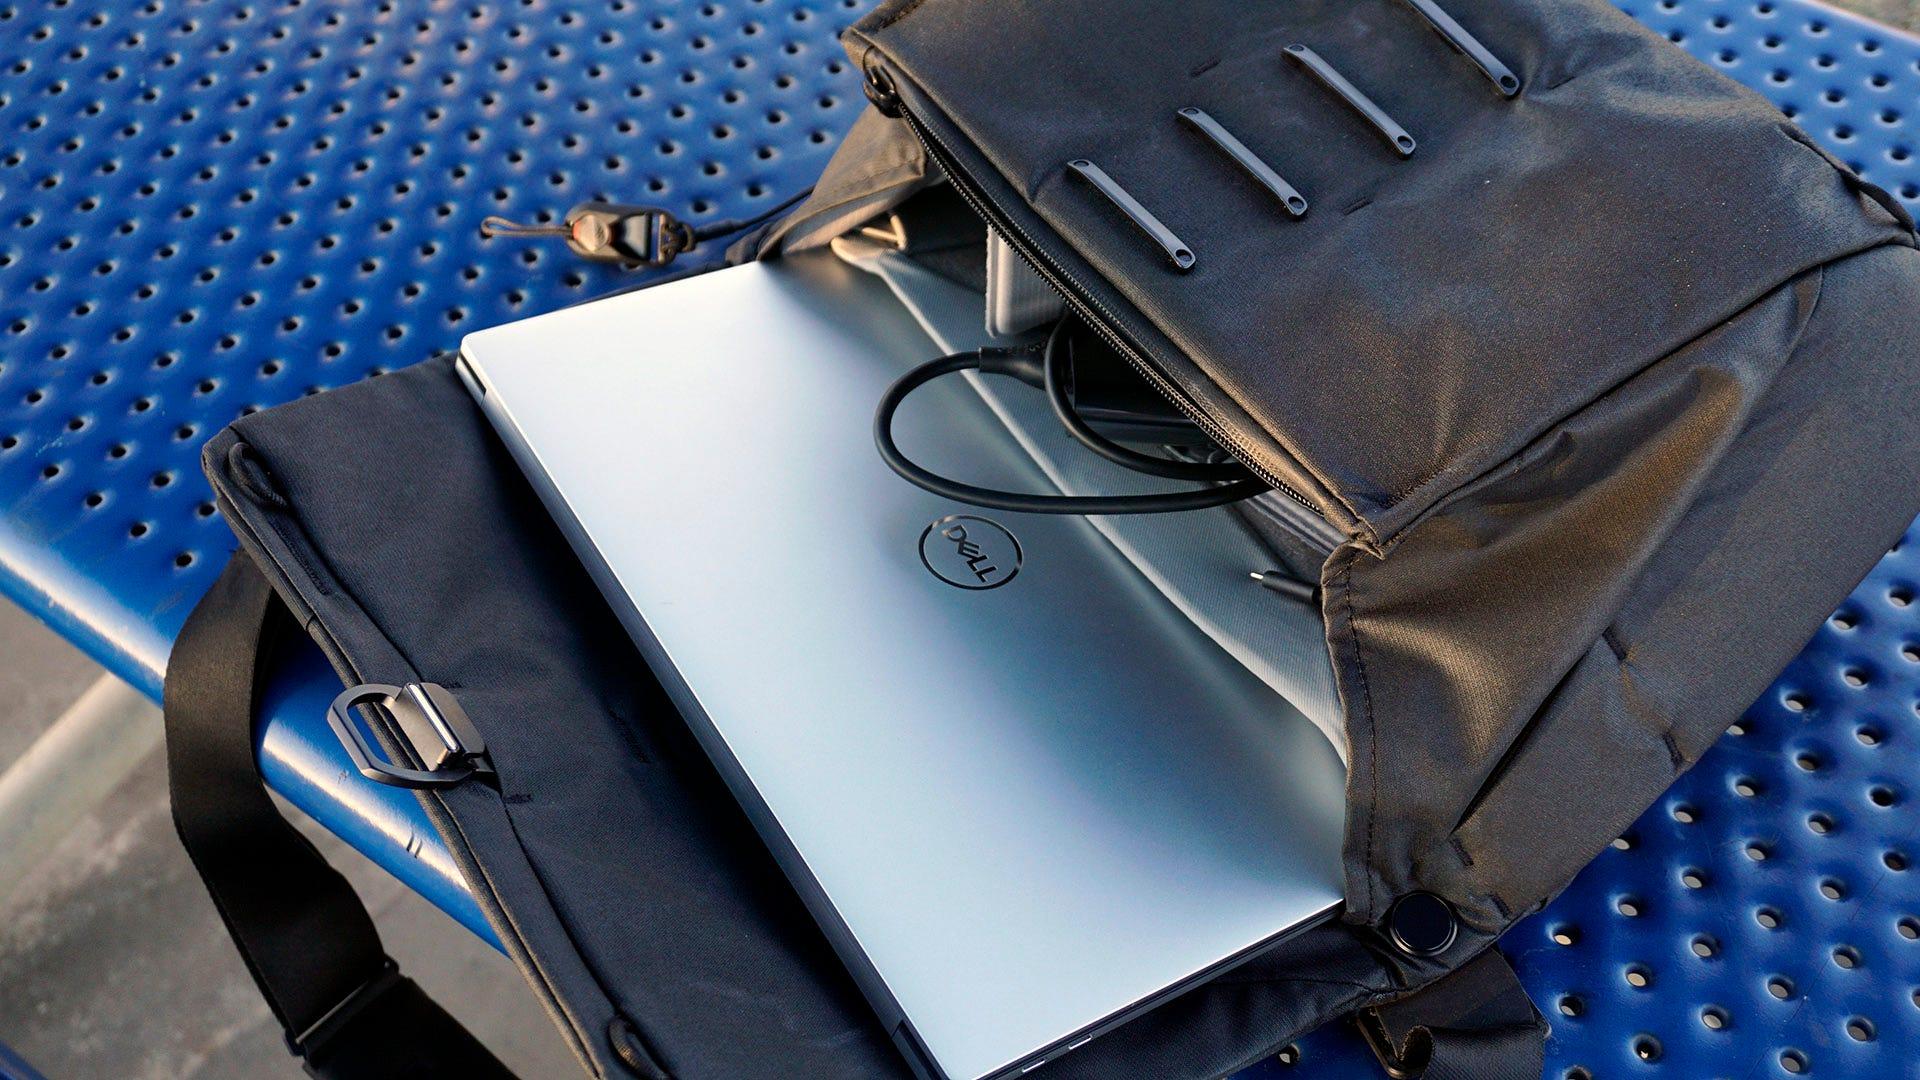 XPS 15 in laptop bag